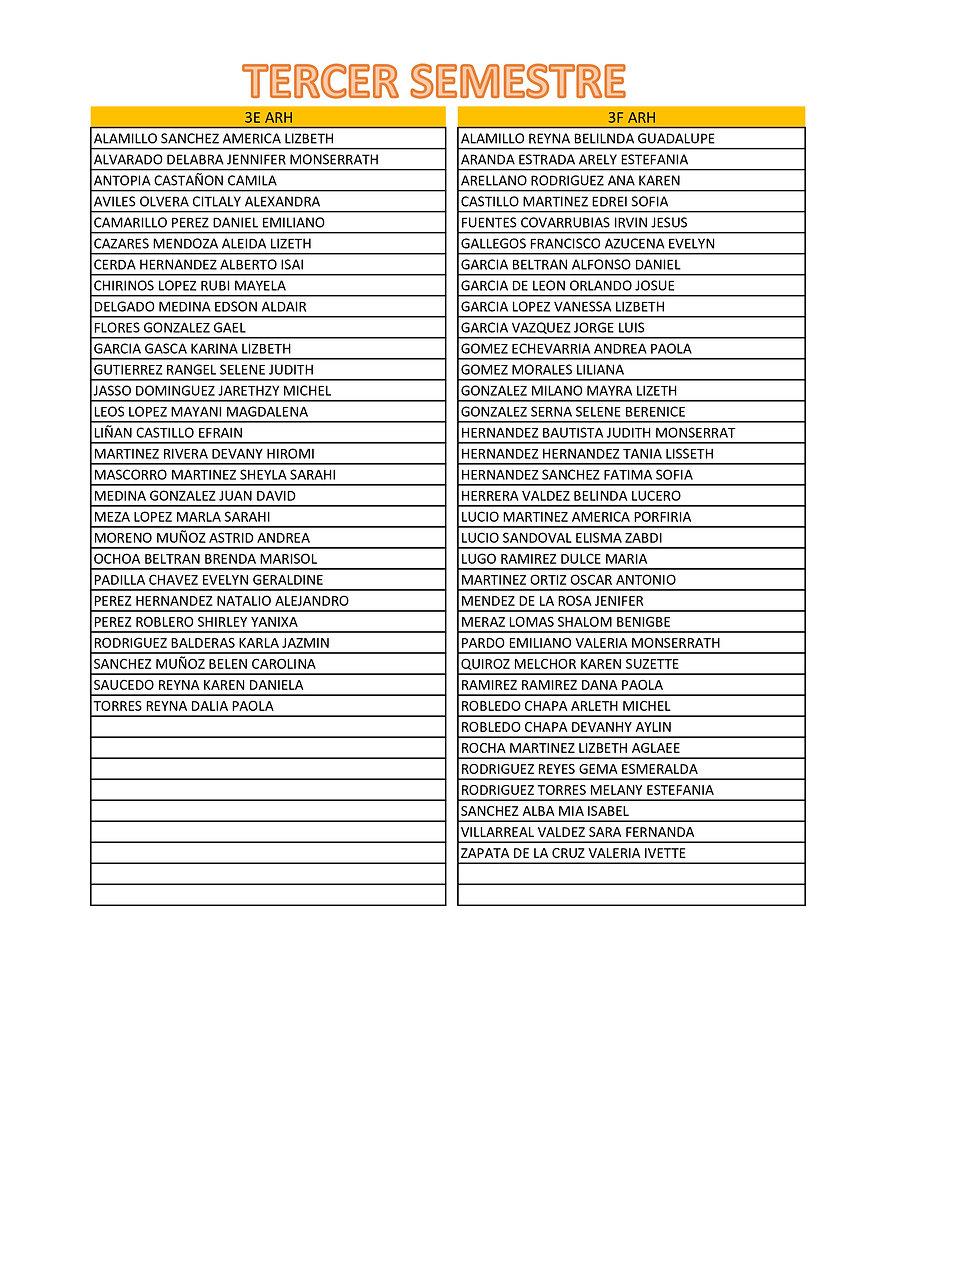 E Y F ARH MATUTINO (pdf.io).jpg